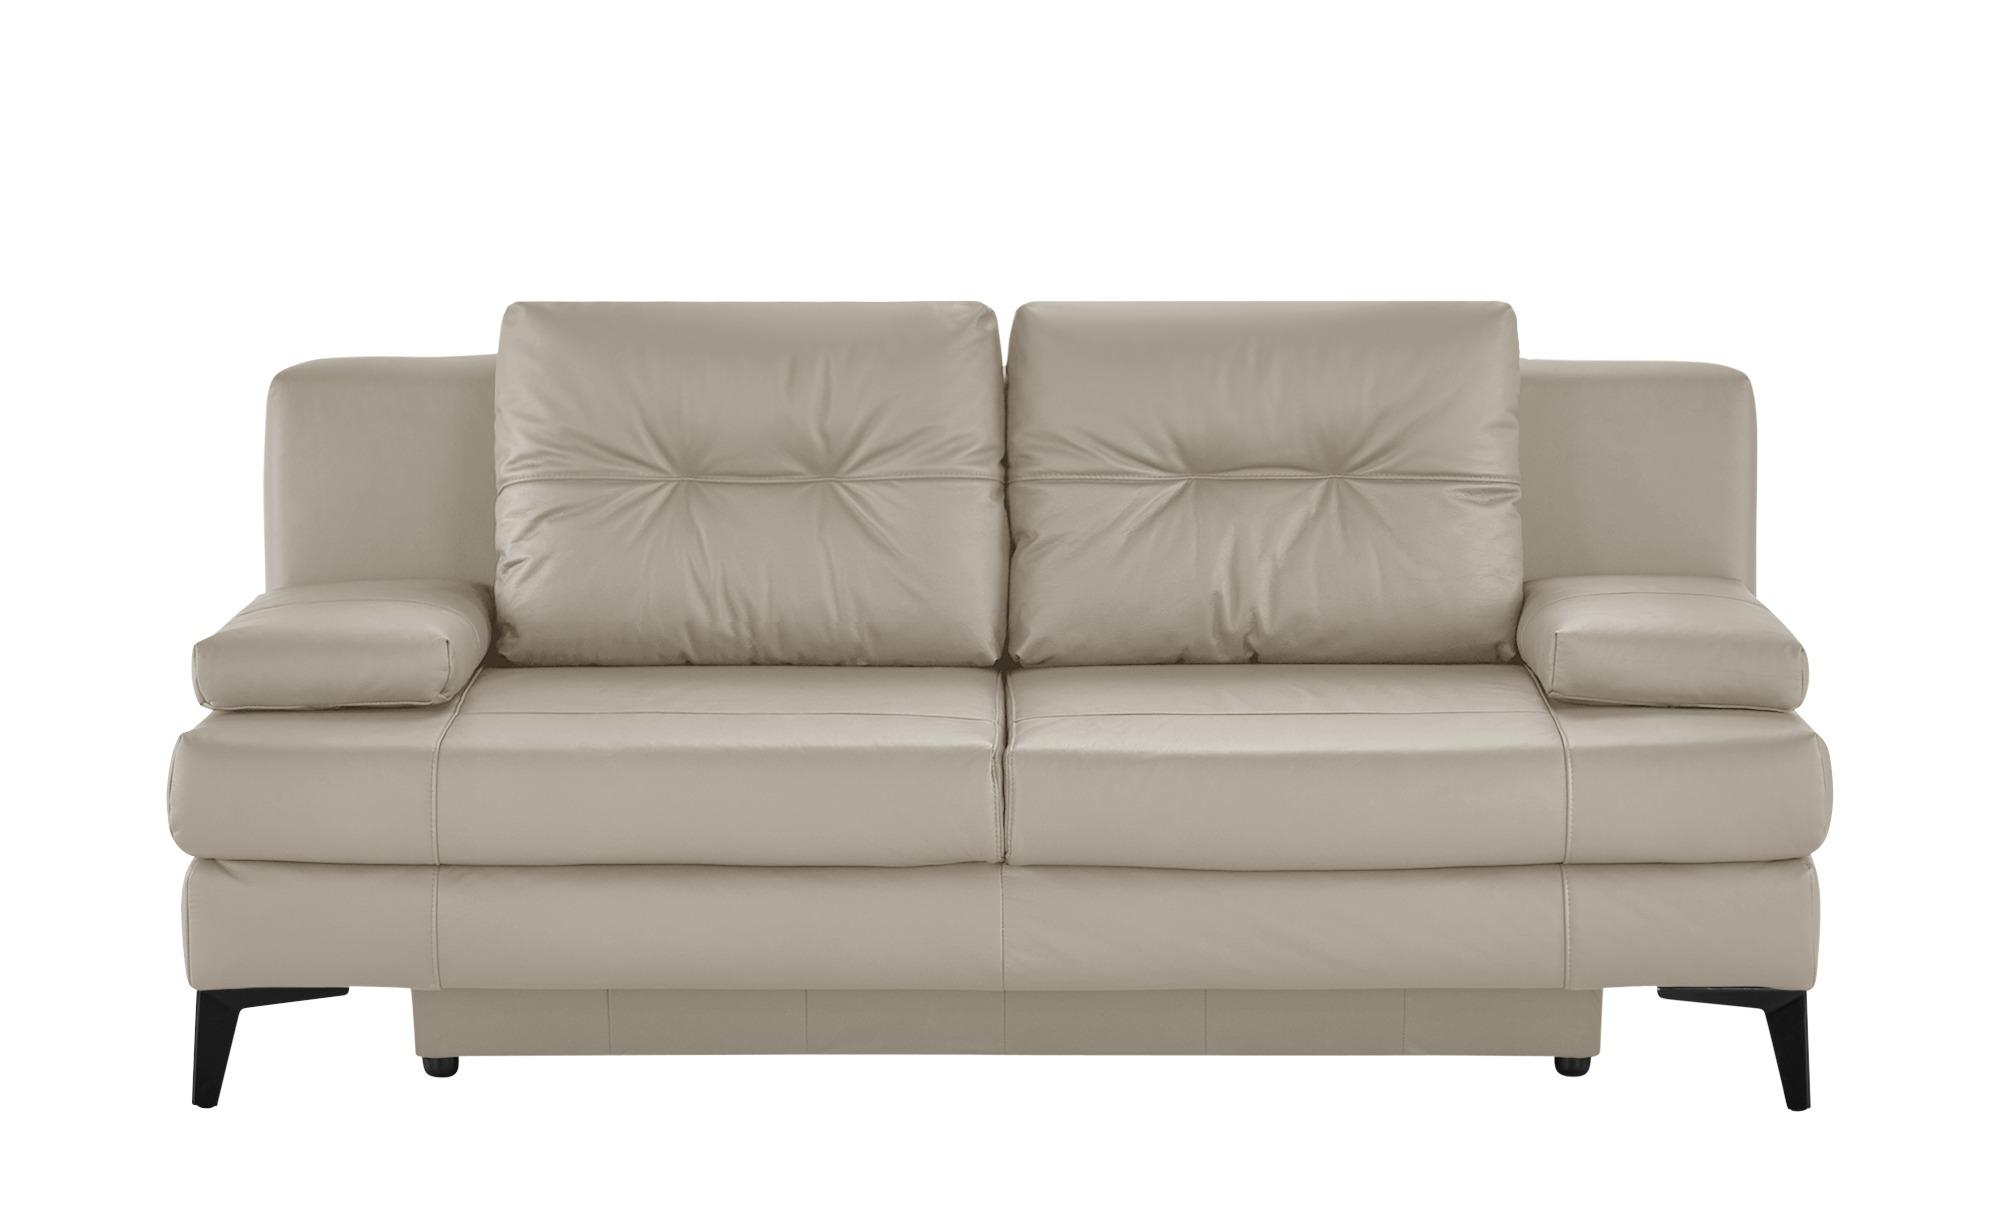 Ledersofa  Svea ¦ beige ¦ Maße (cm): B: 202 H: 92 T: 100 Polstermöbel > Sofas > 2-Sitzer - Höffner